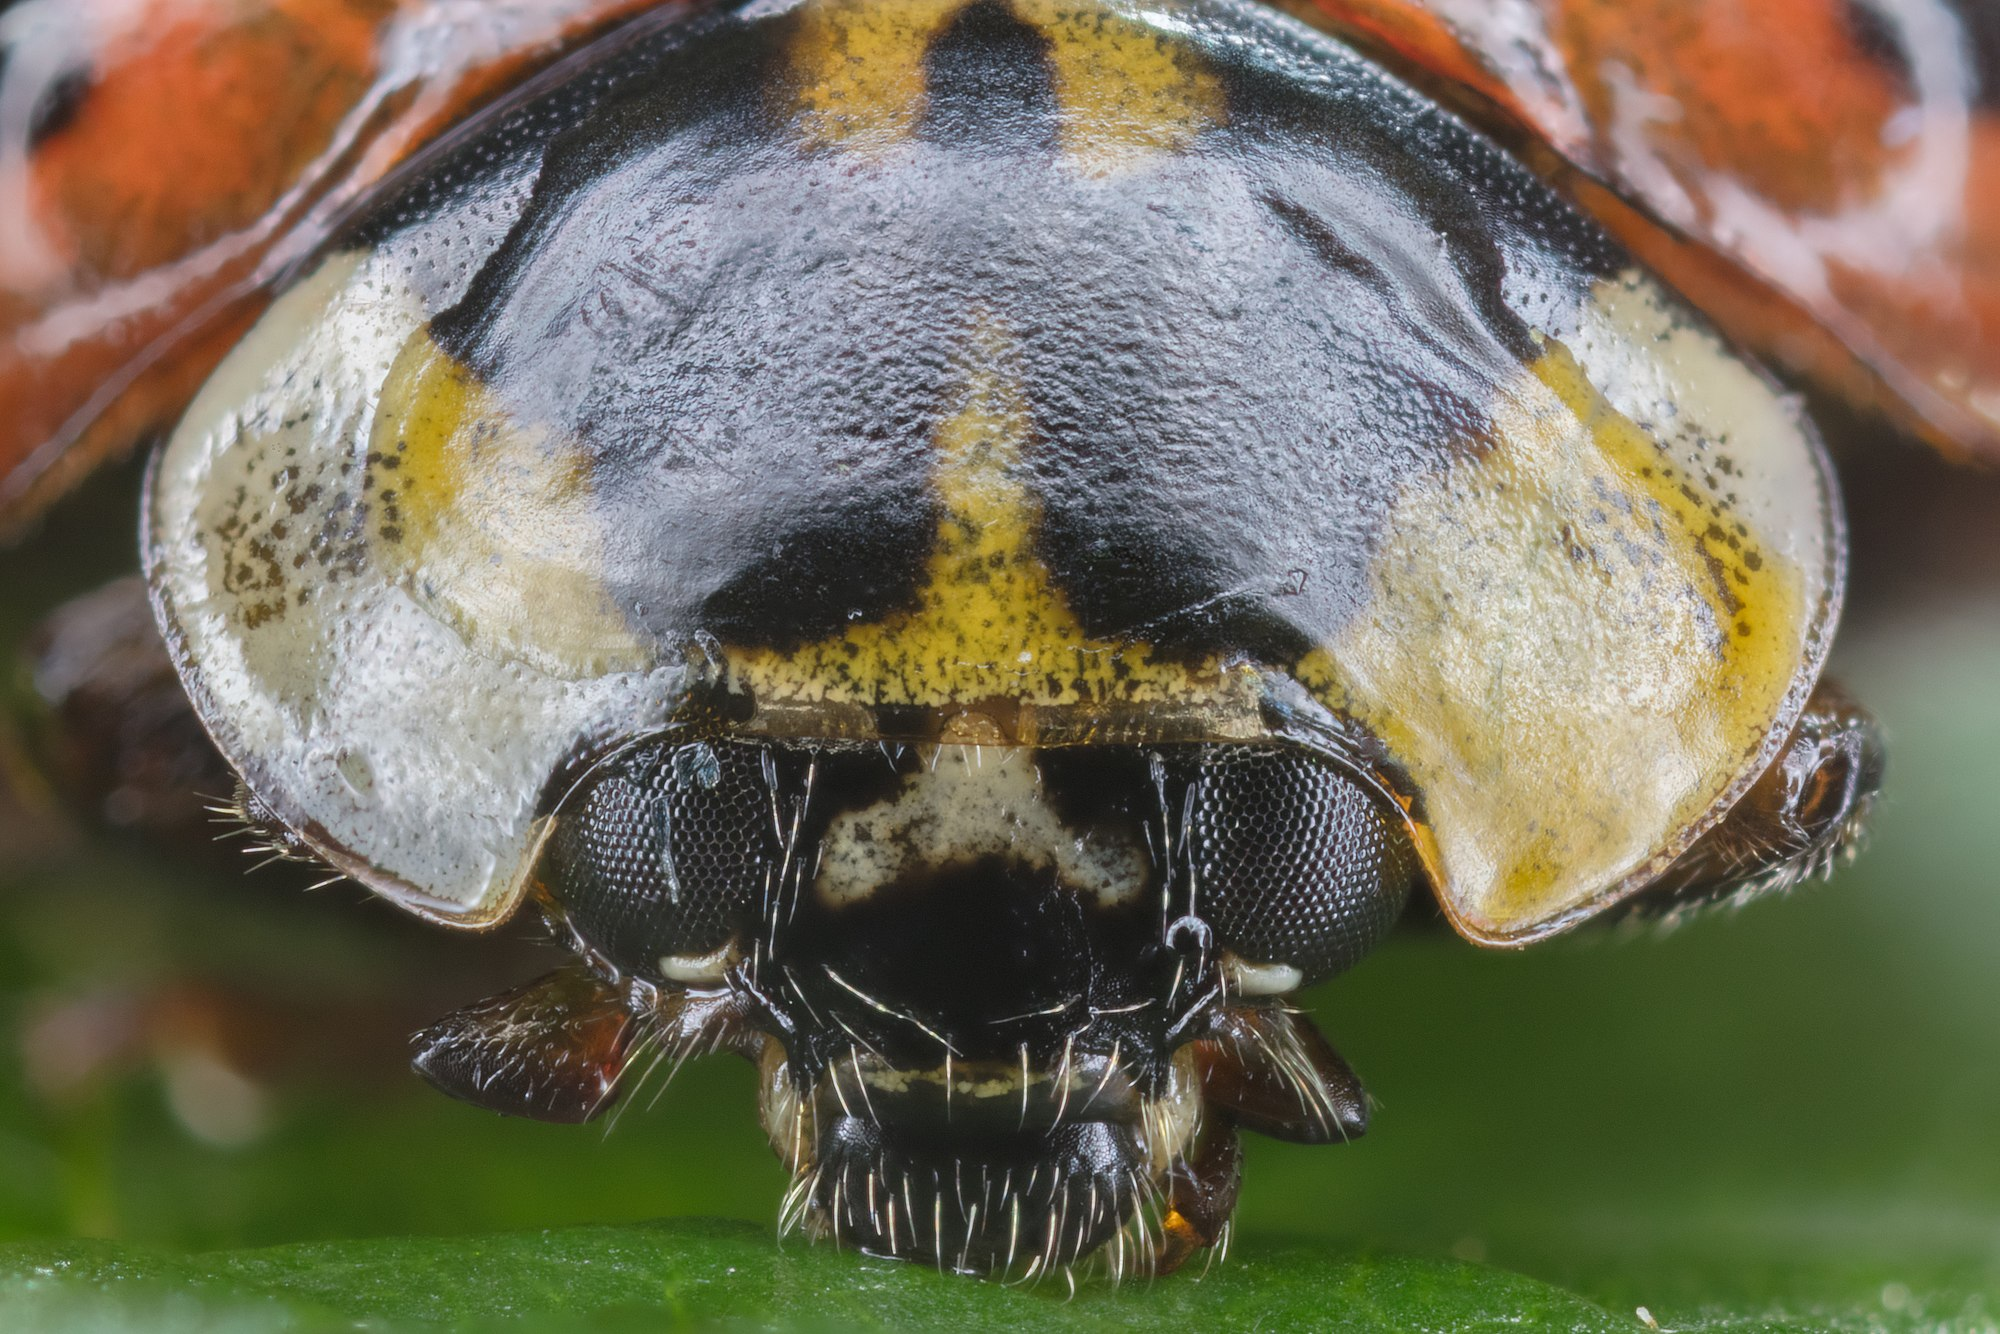 Asian ladybeetle (Harmonia axyridis), Hartelholz, Munich, Germany